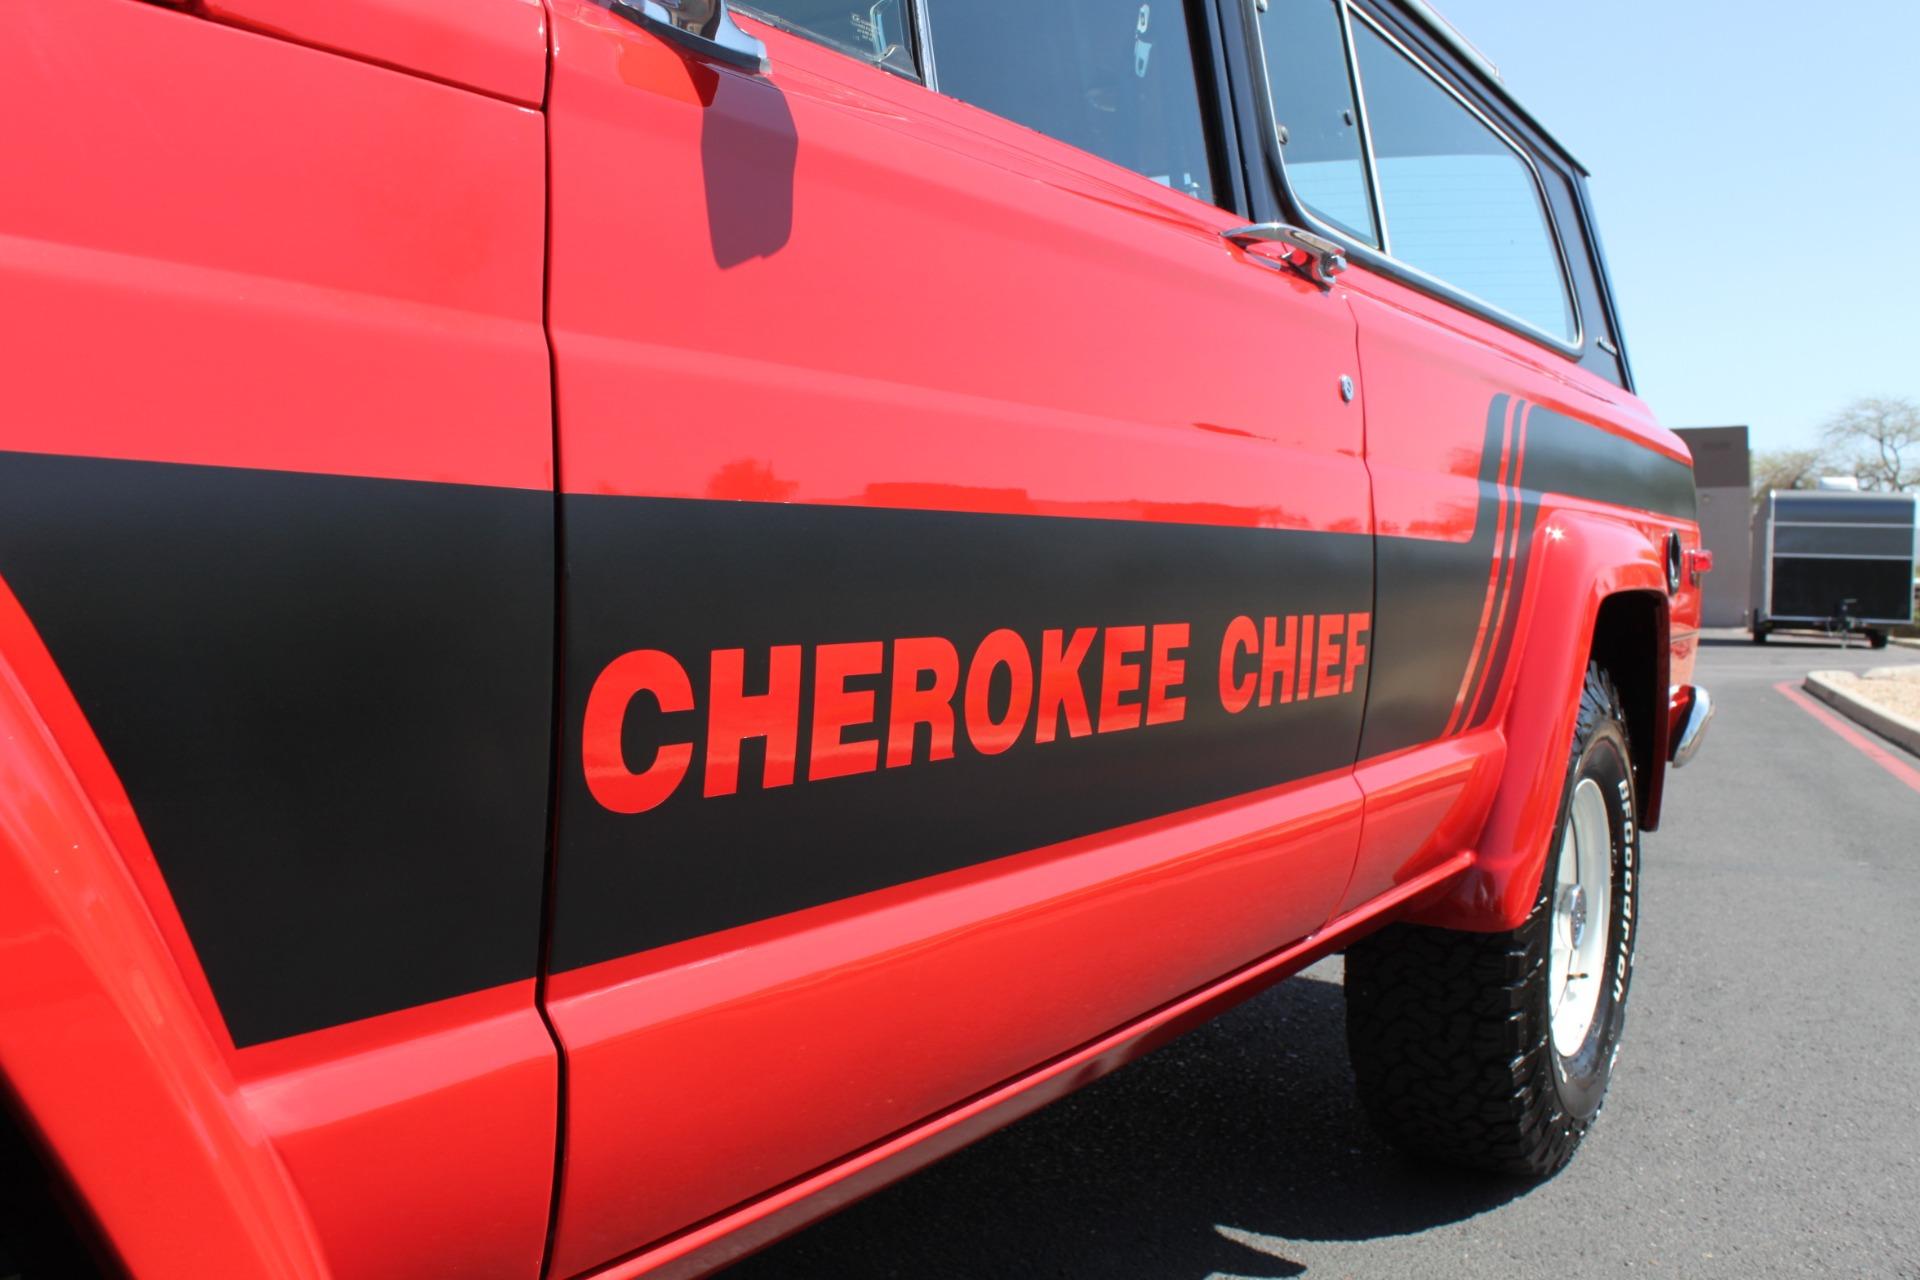 Used-1983-Jeep-Cherokee-4WD-Chief-Mini